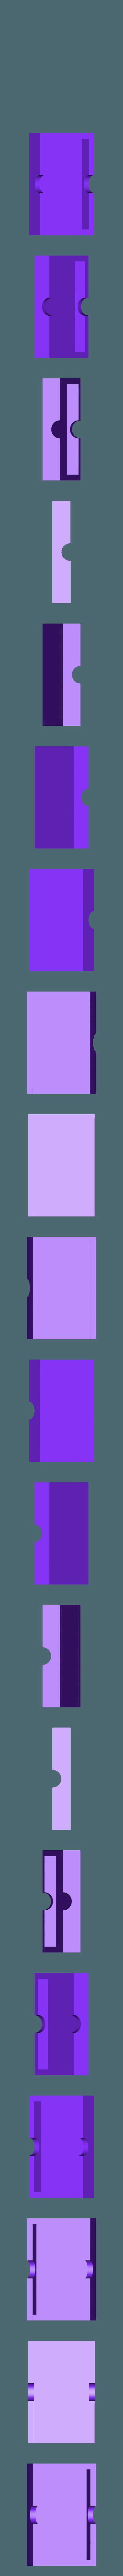 box.stl Download STL file Chocolate Bar Puzzle • 3D print design, mtairymd